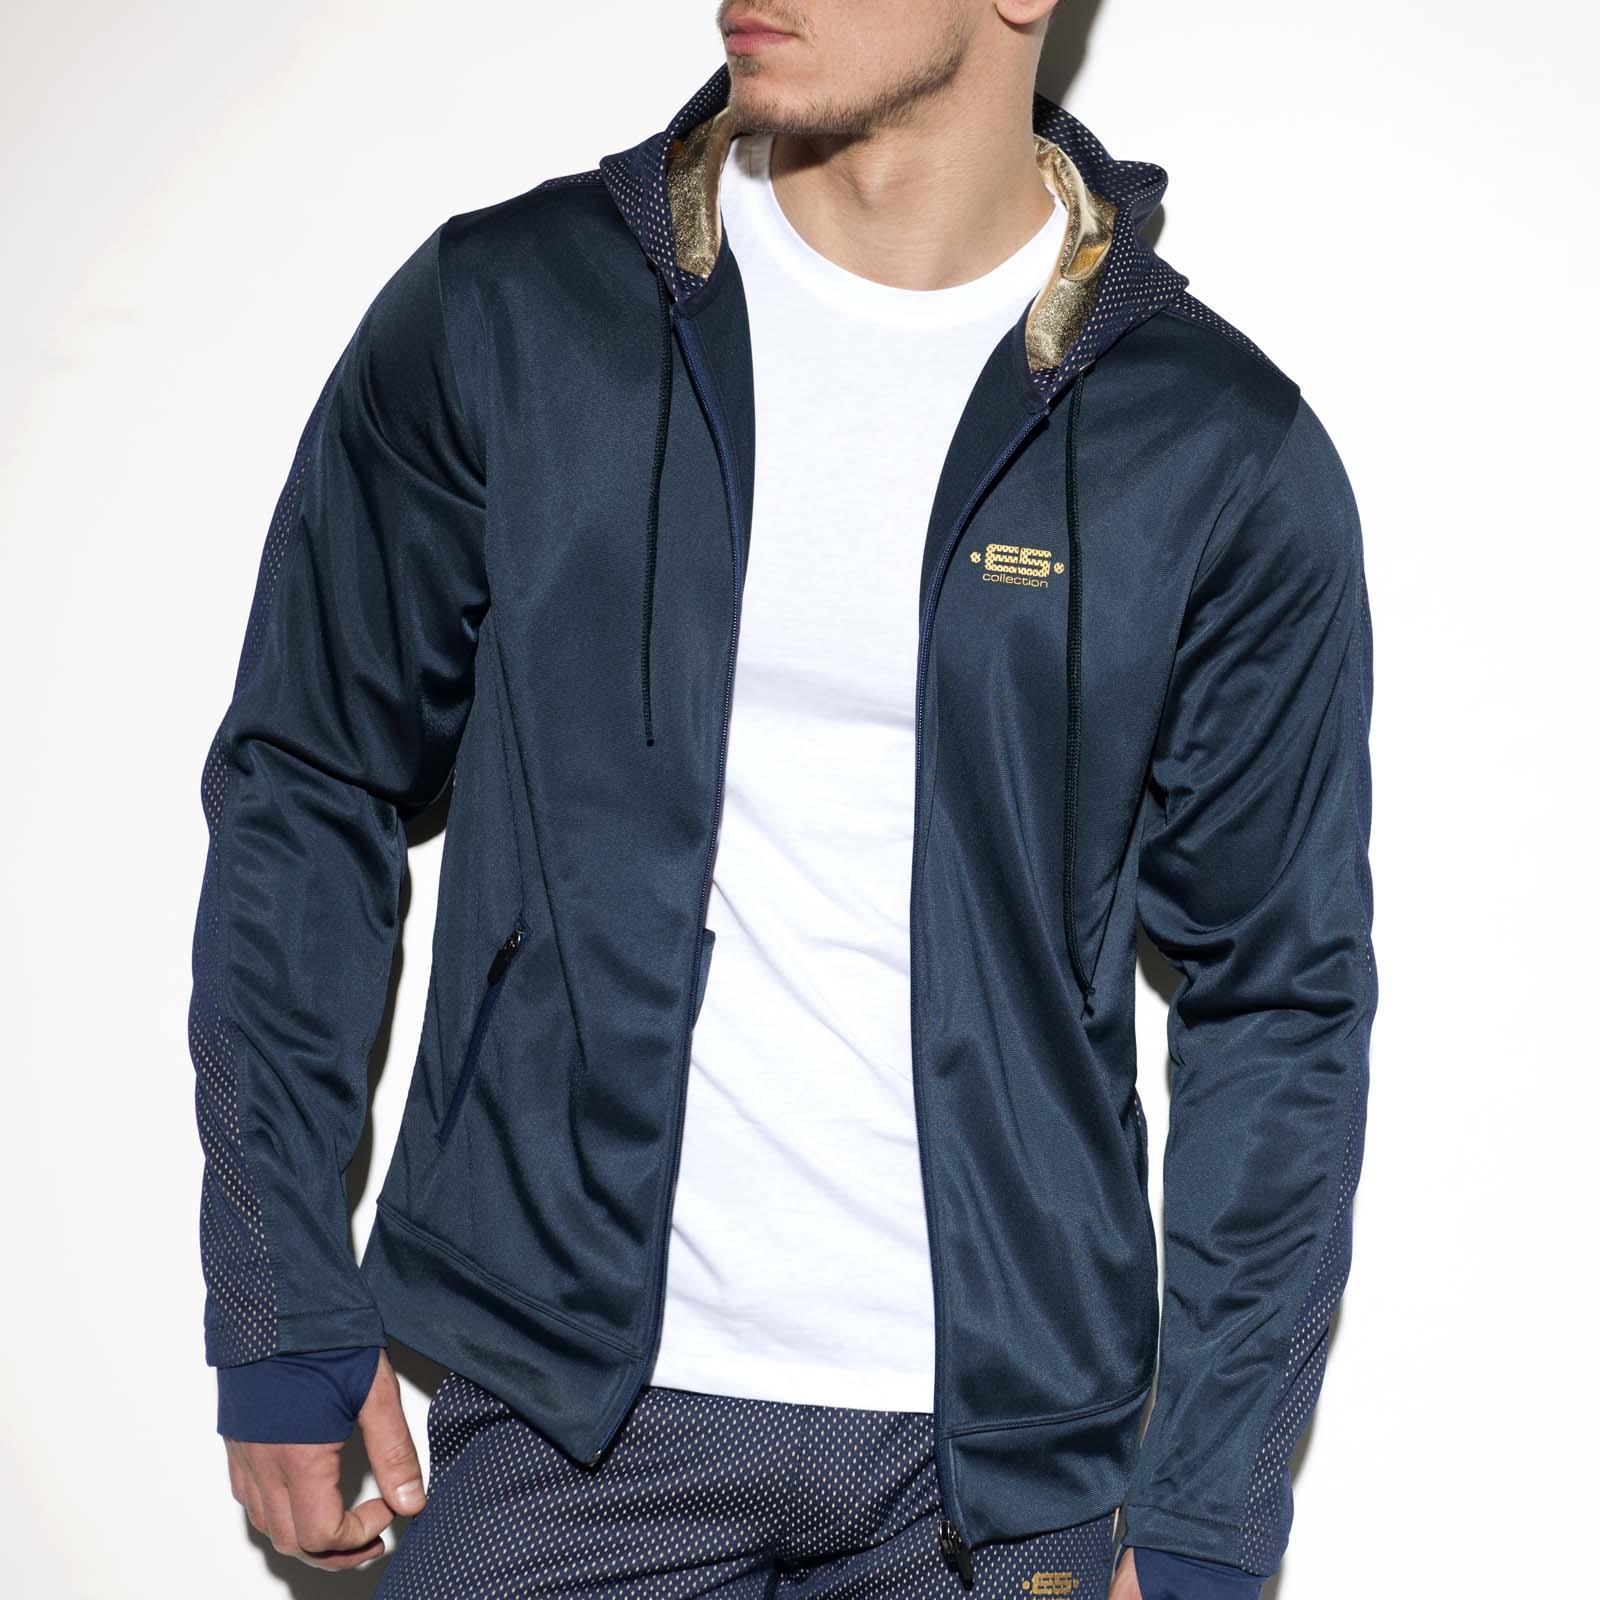 Jacket ES Collection Metallic Mesh SP144